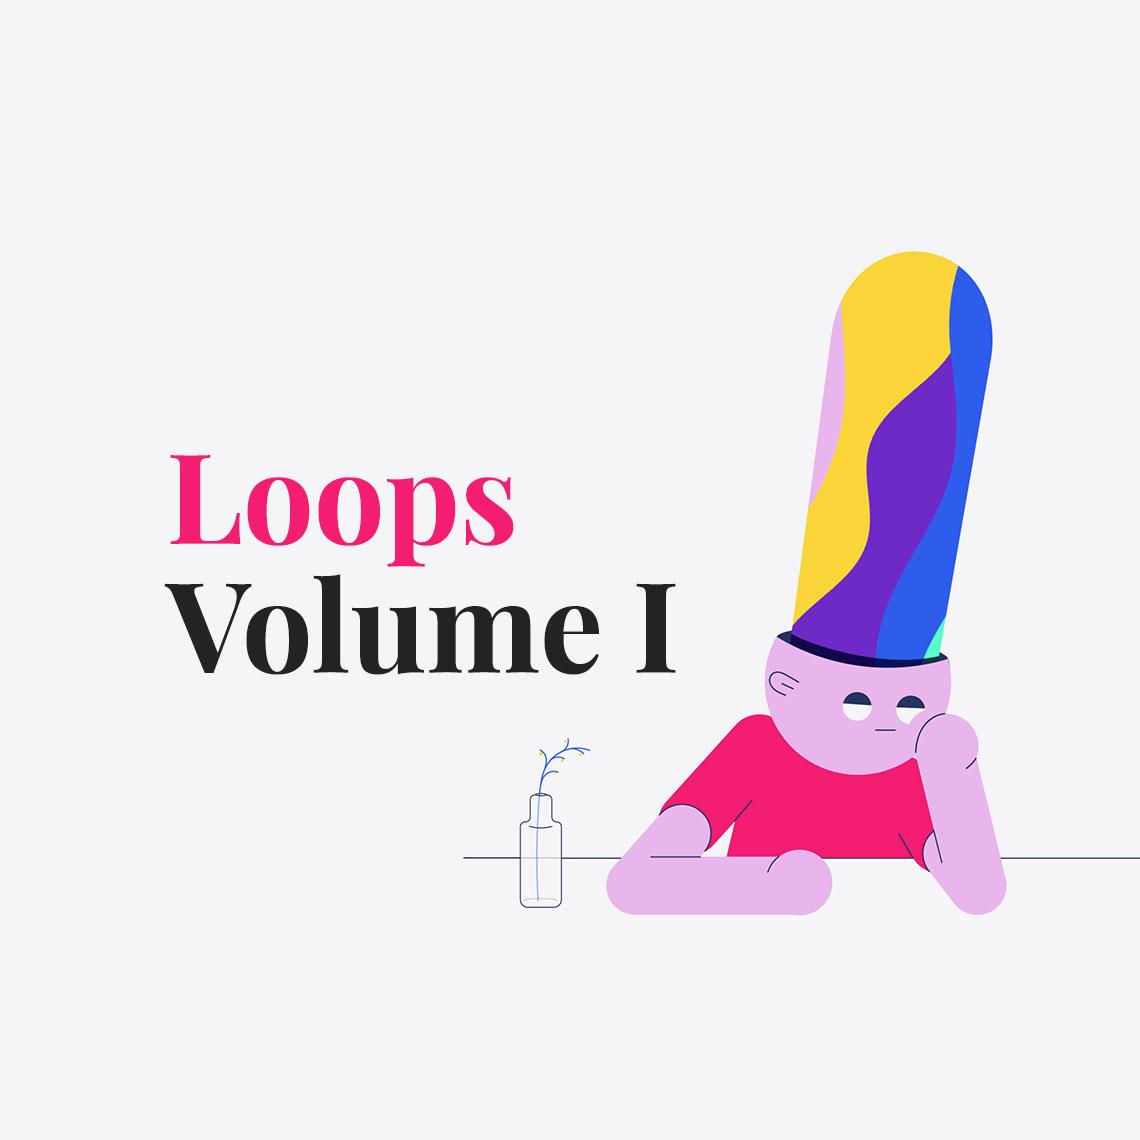 Loops: Volume I